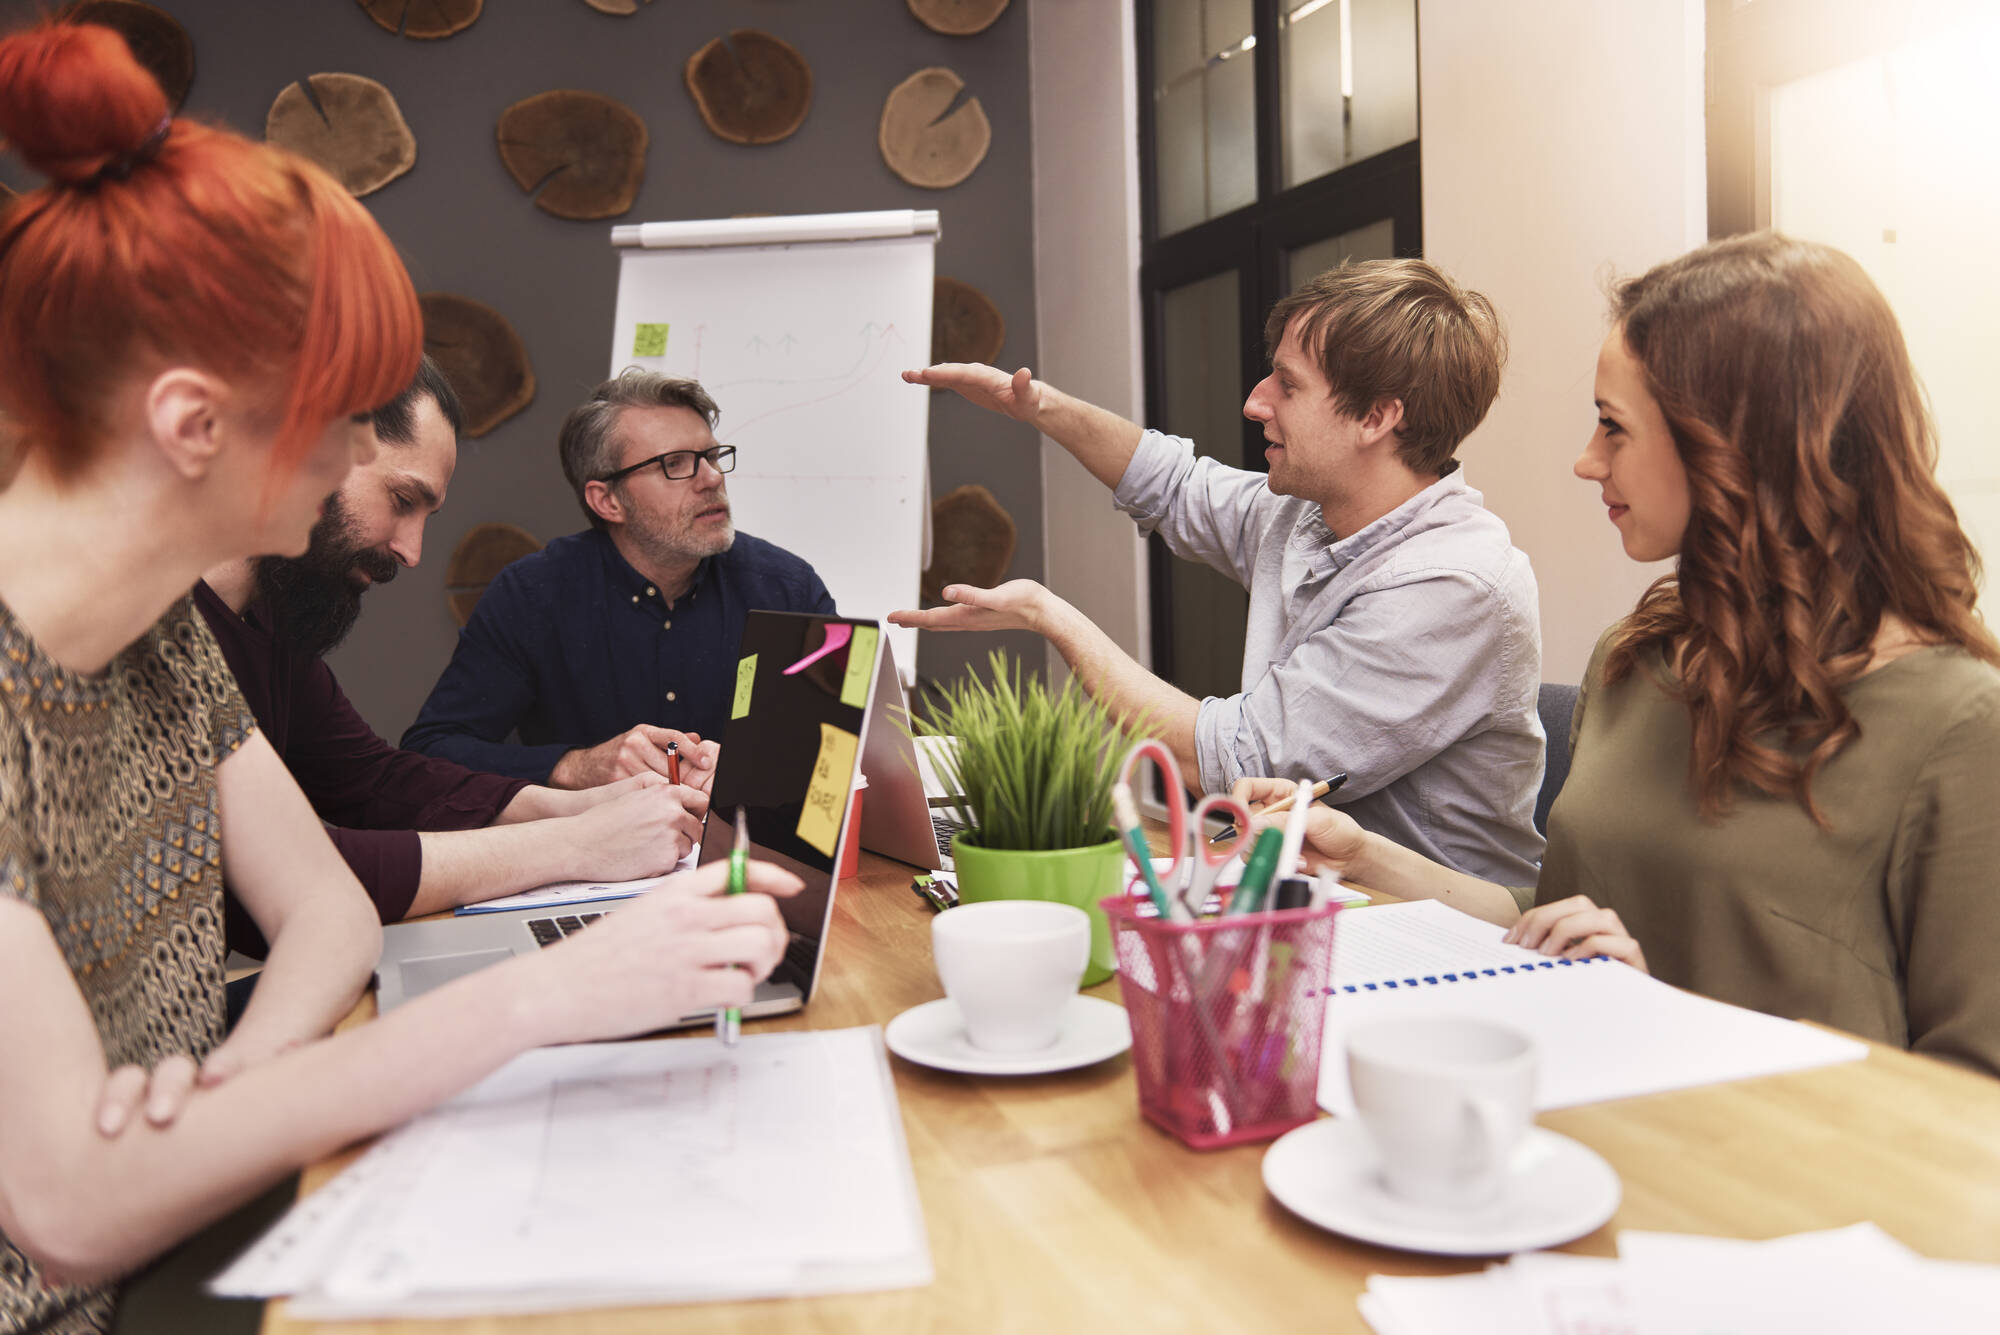 team working analyzing business' growth